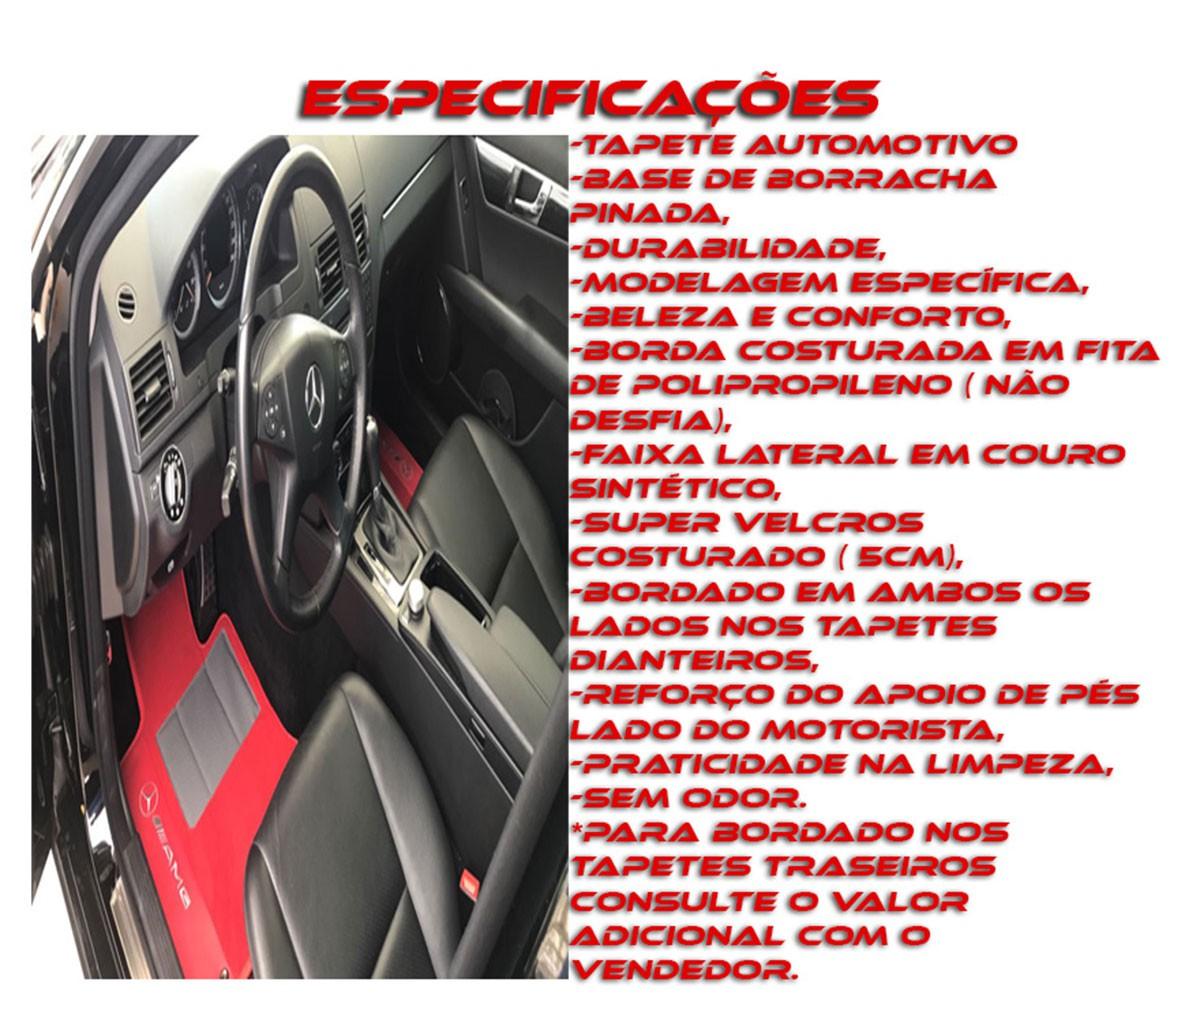 Tapete Chevrolet Astra Borracha Pvc Com Base Pinada